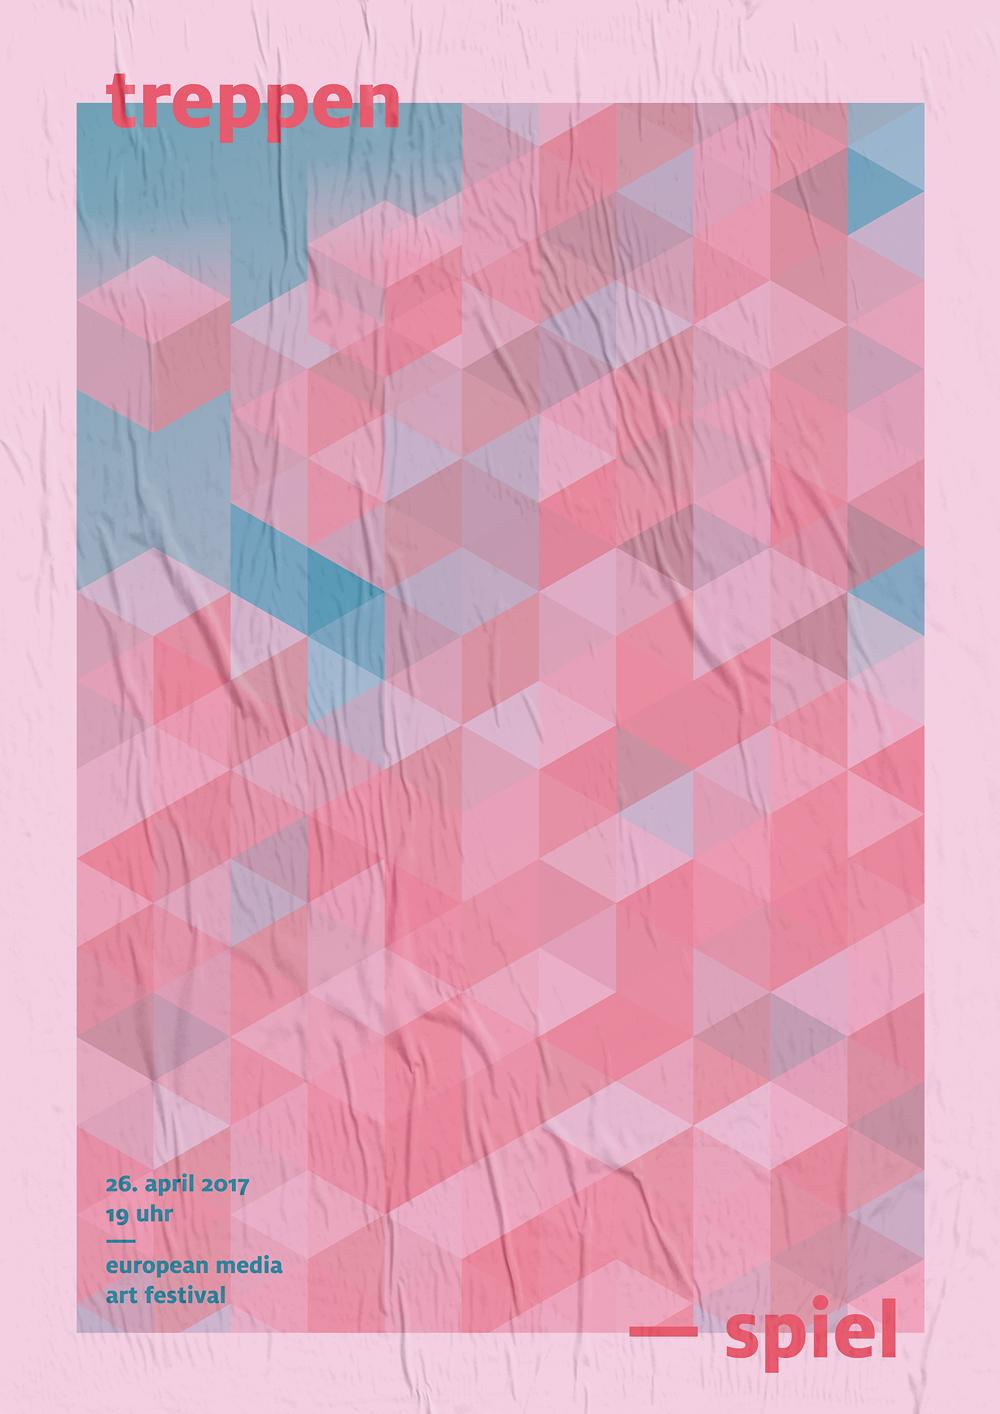 003_Cirrus_Poster